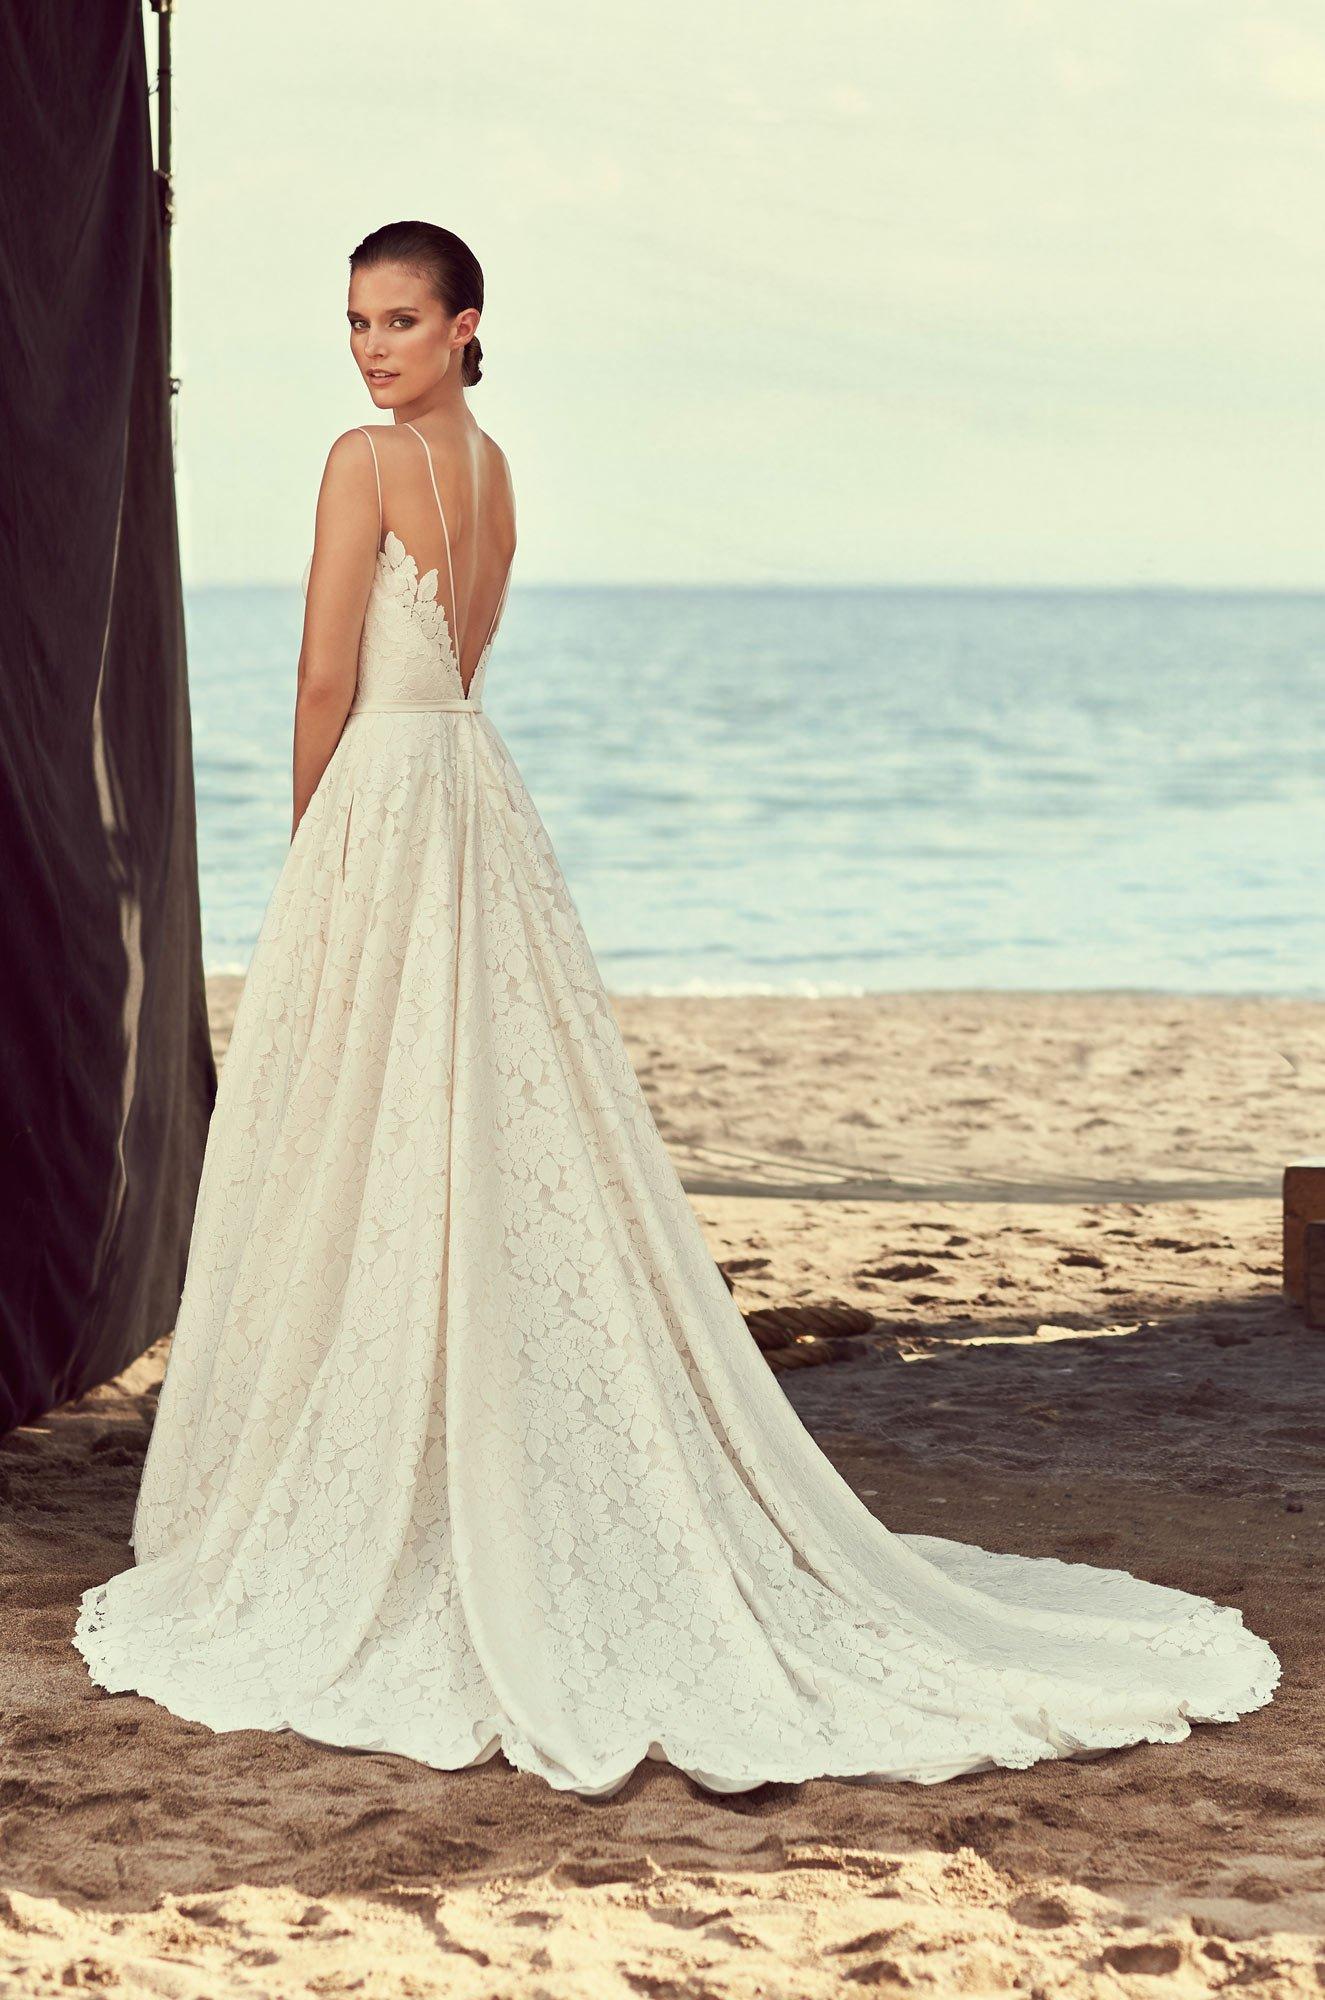 Full Lace Skirt Wedding Dress Style 2188 Mikaella Bridal